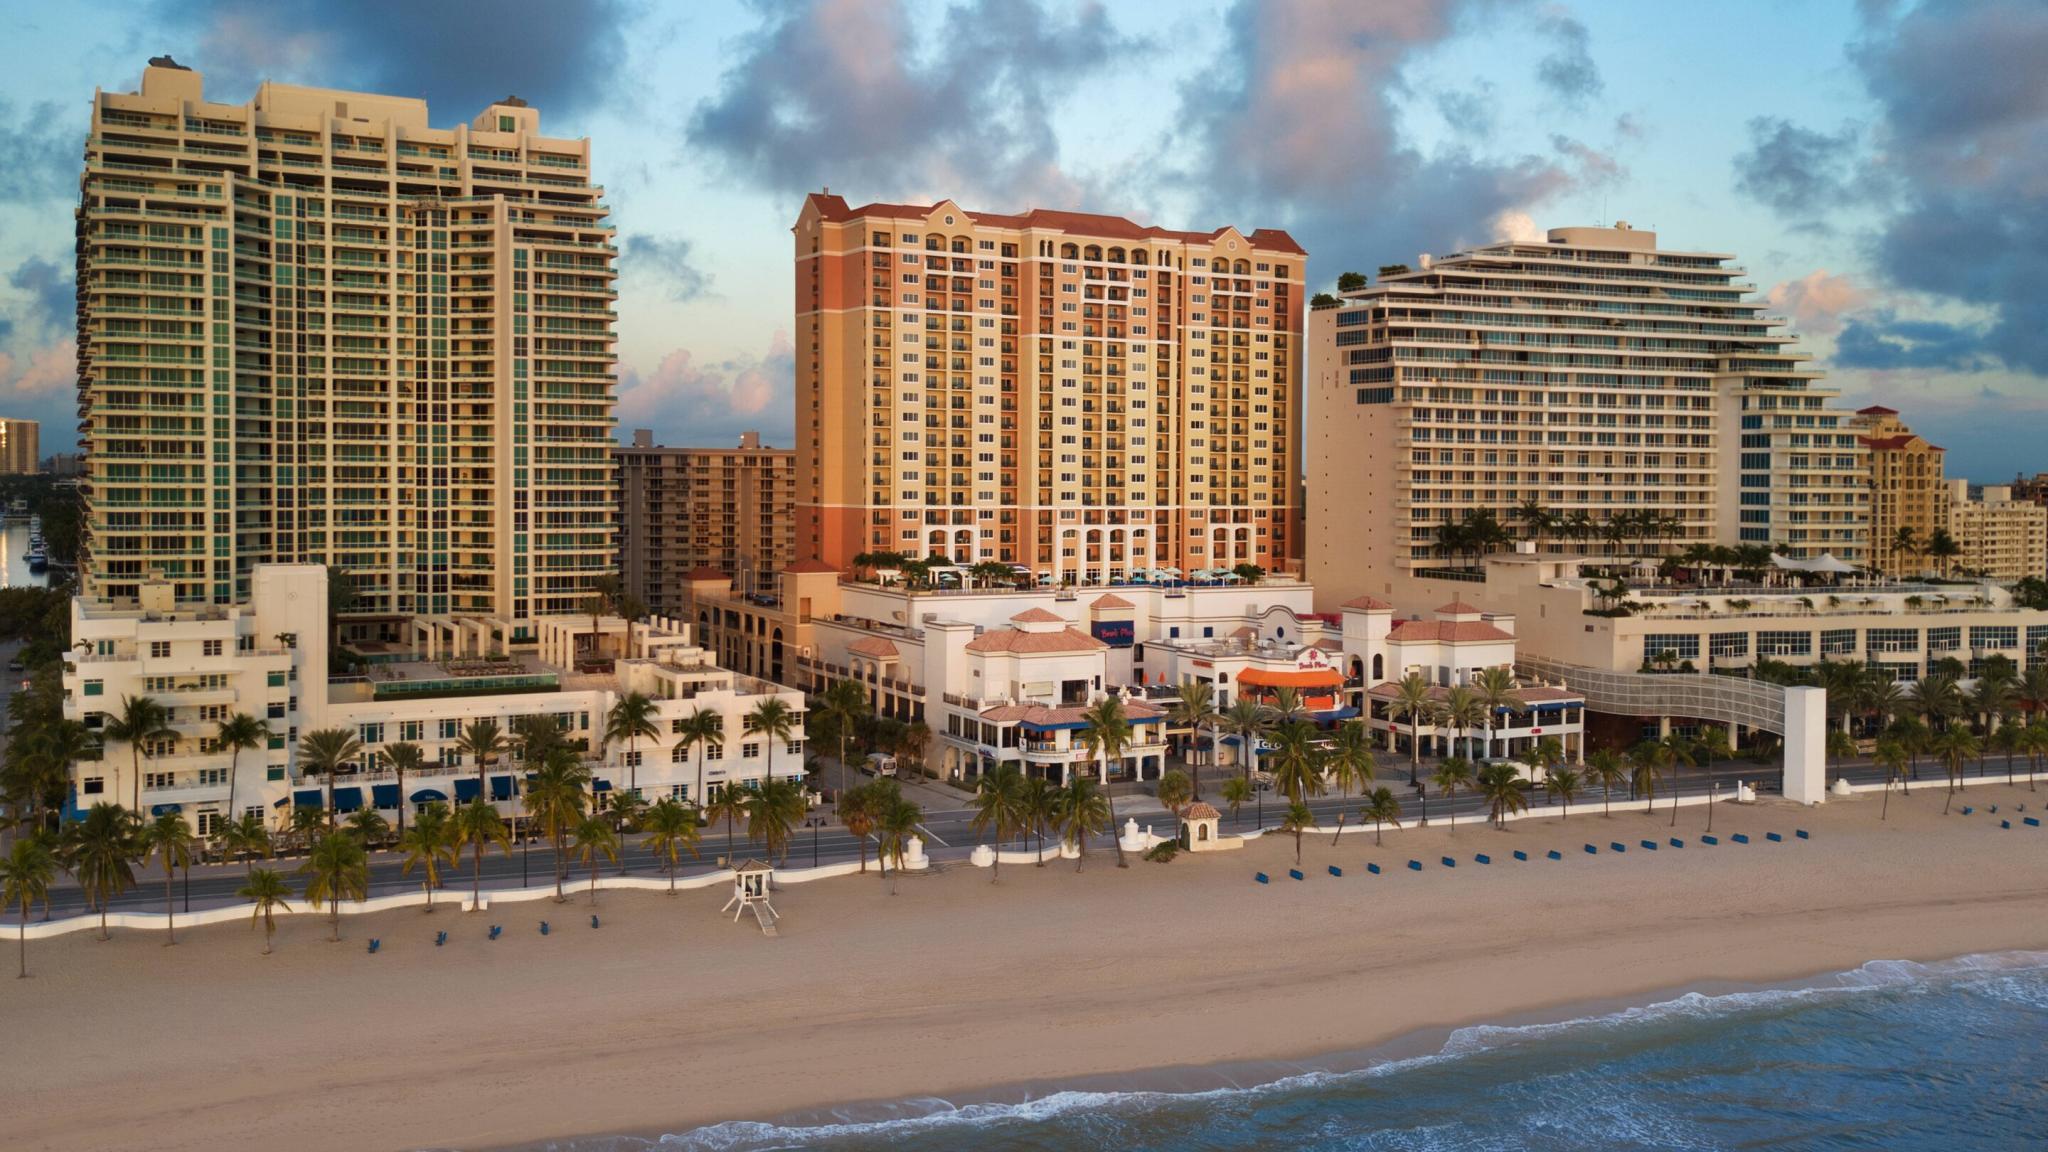 22. Marriott Beachplace Towers